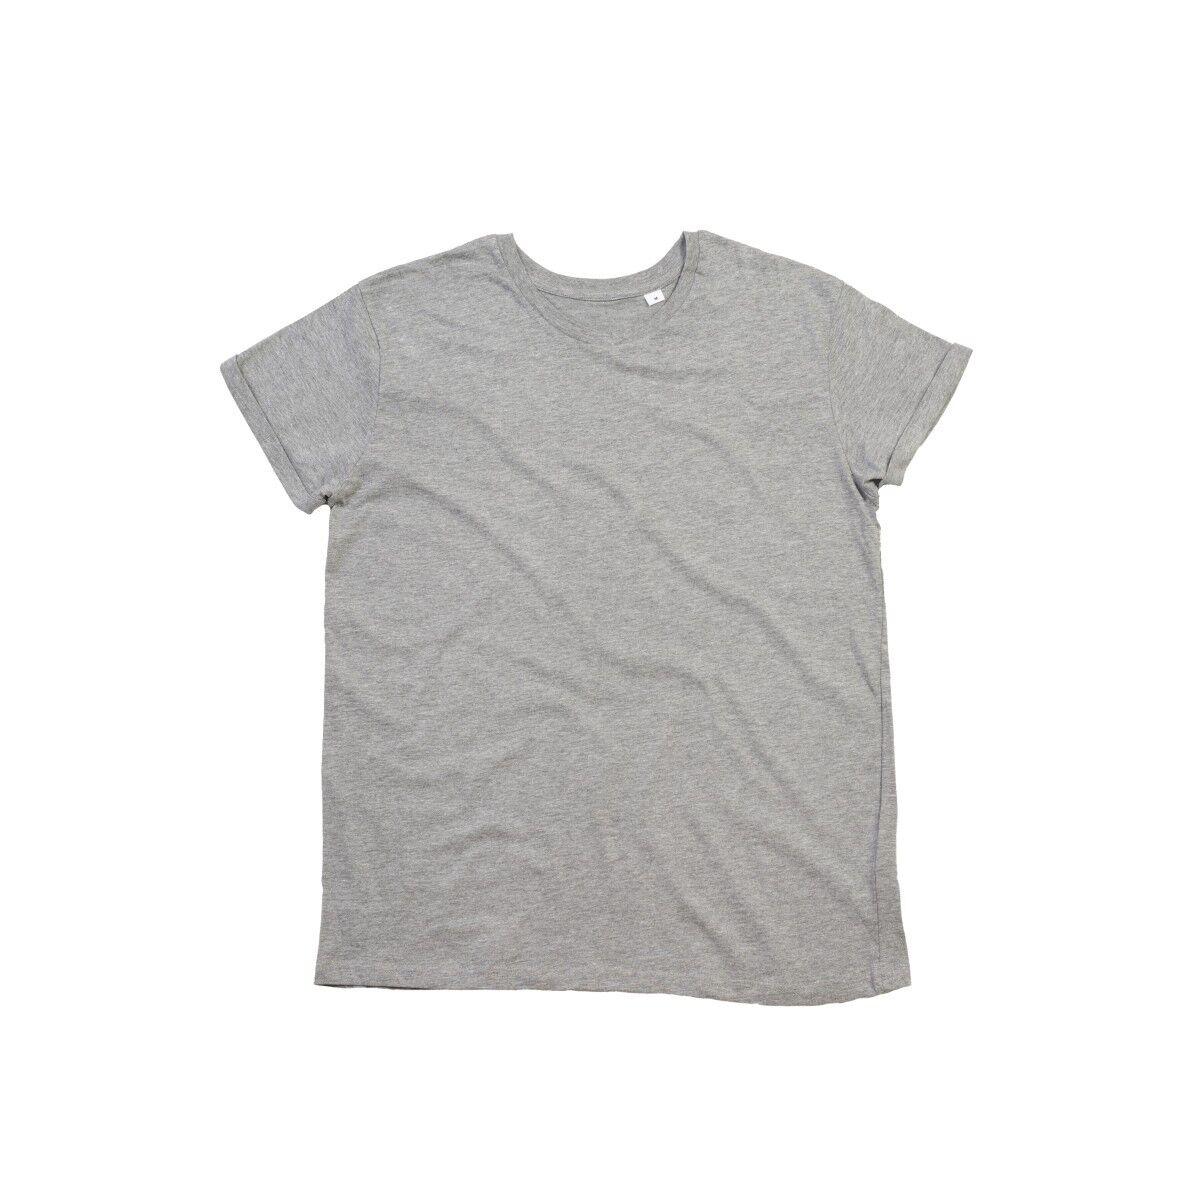 Mantis Roll Sleeve T Shirt - Heather Grey